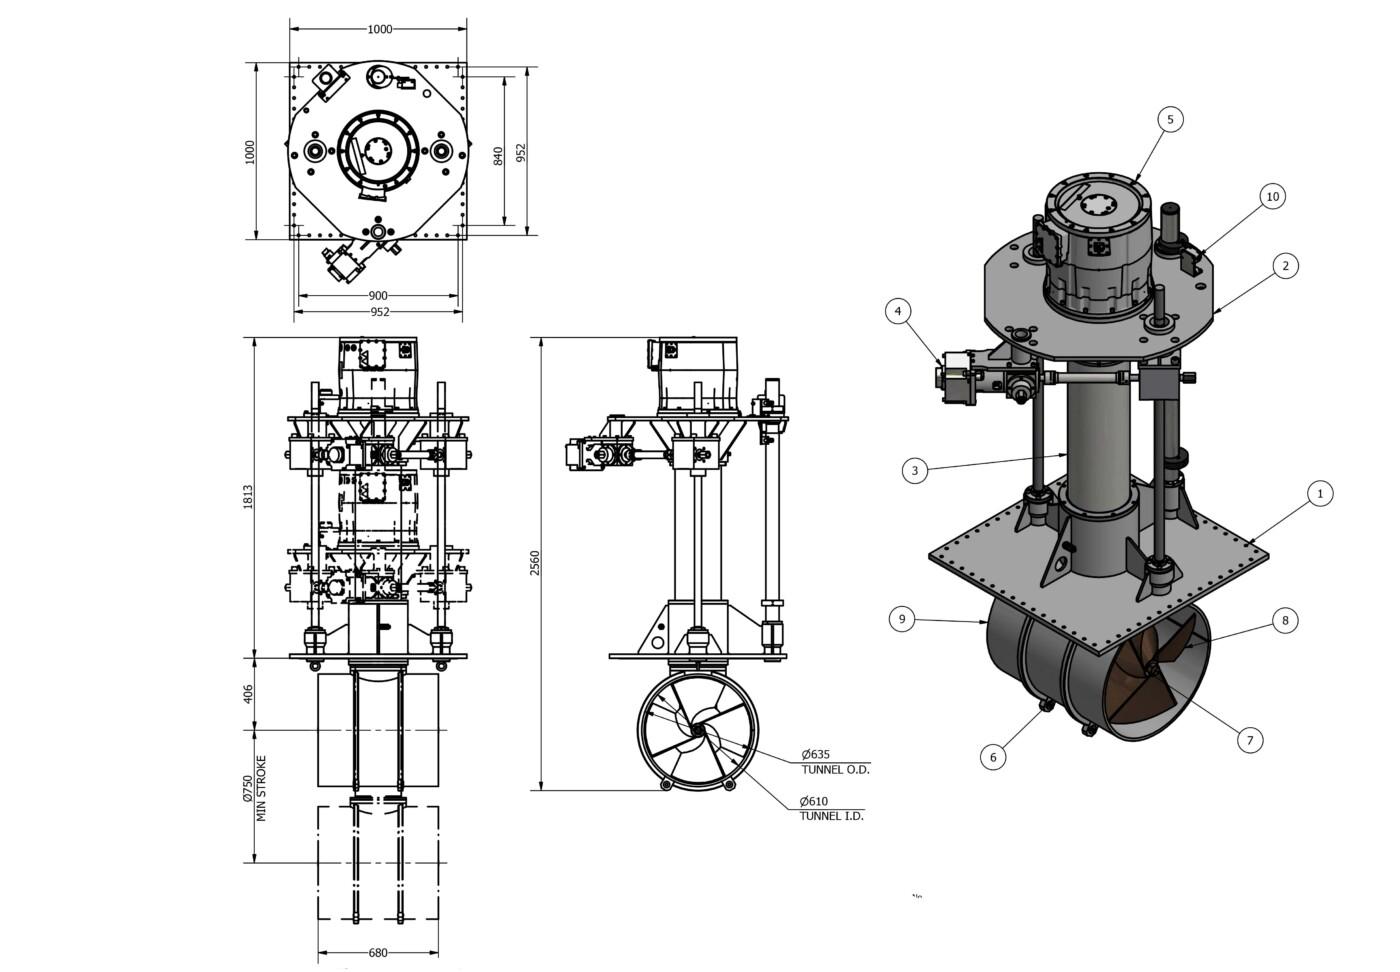 OMS Electrical Thruster E-0600-V